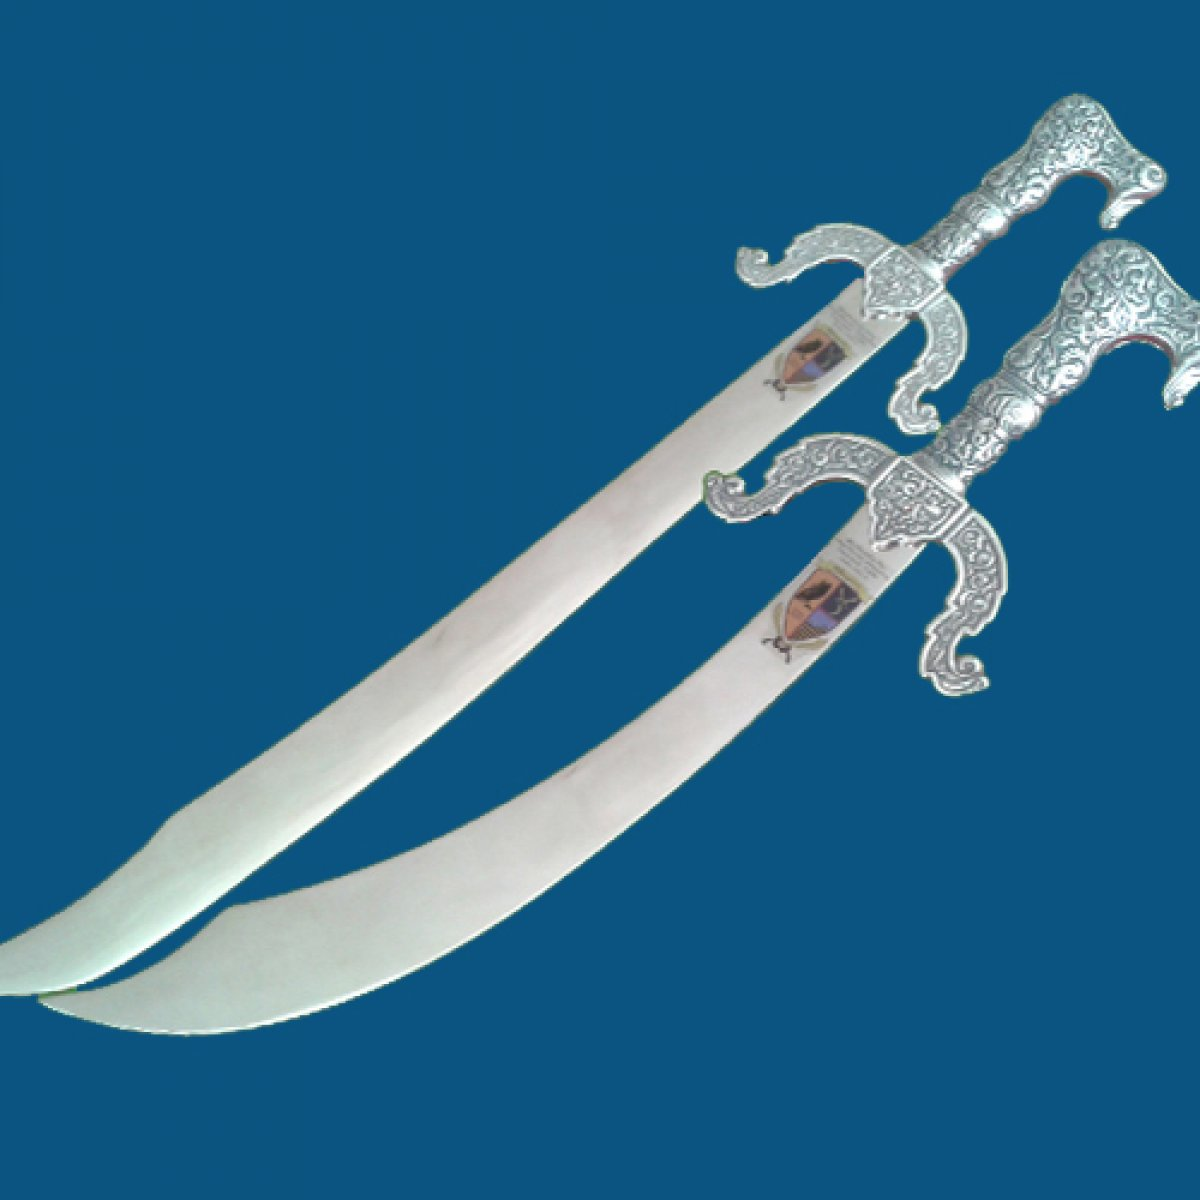 Espadas Cimarra 1